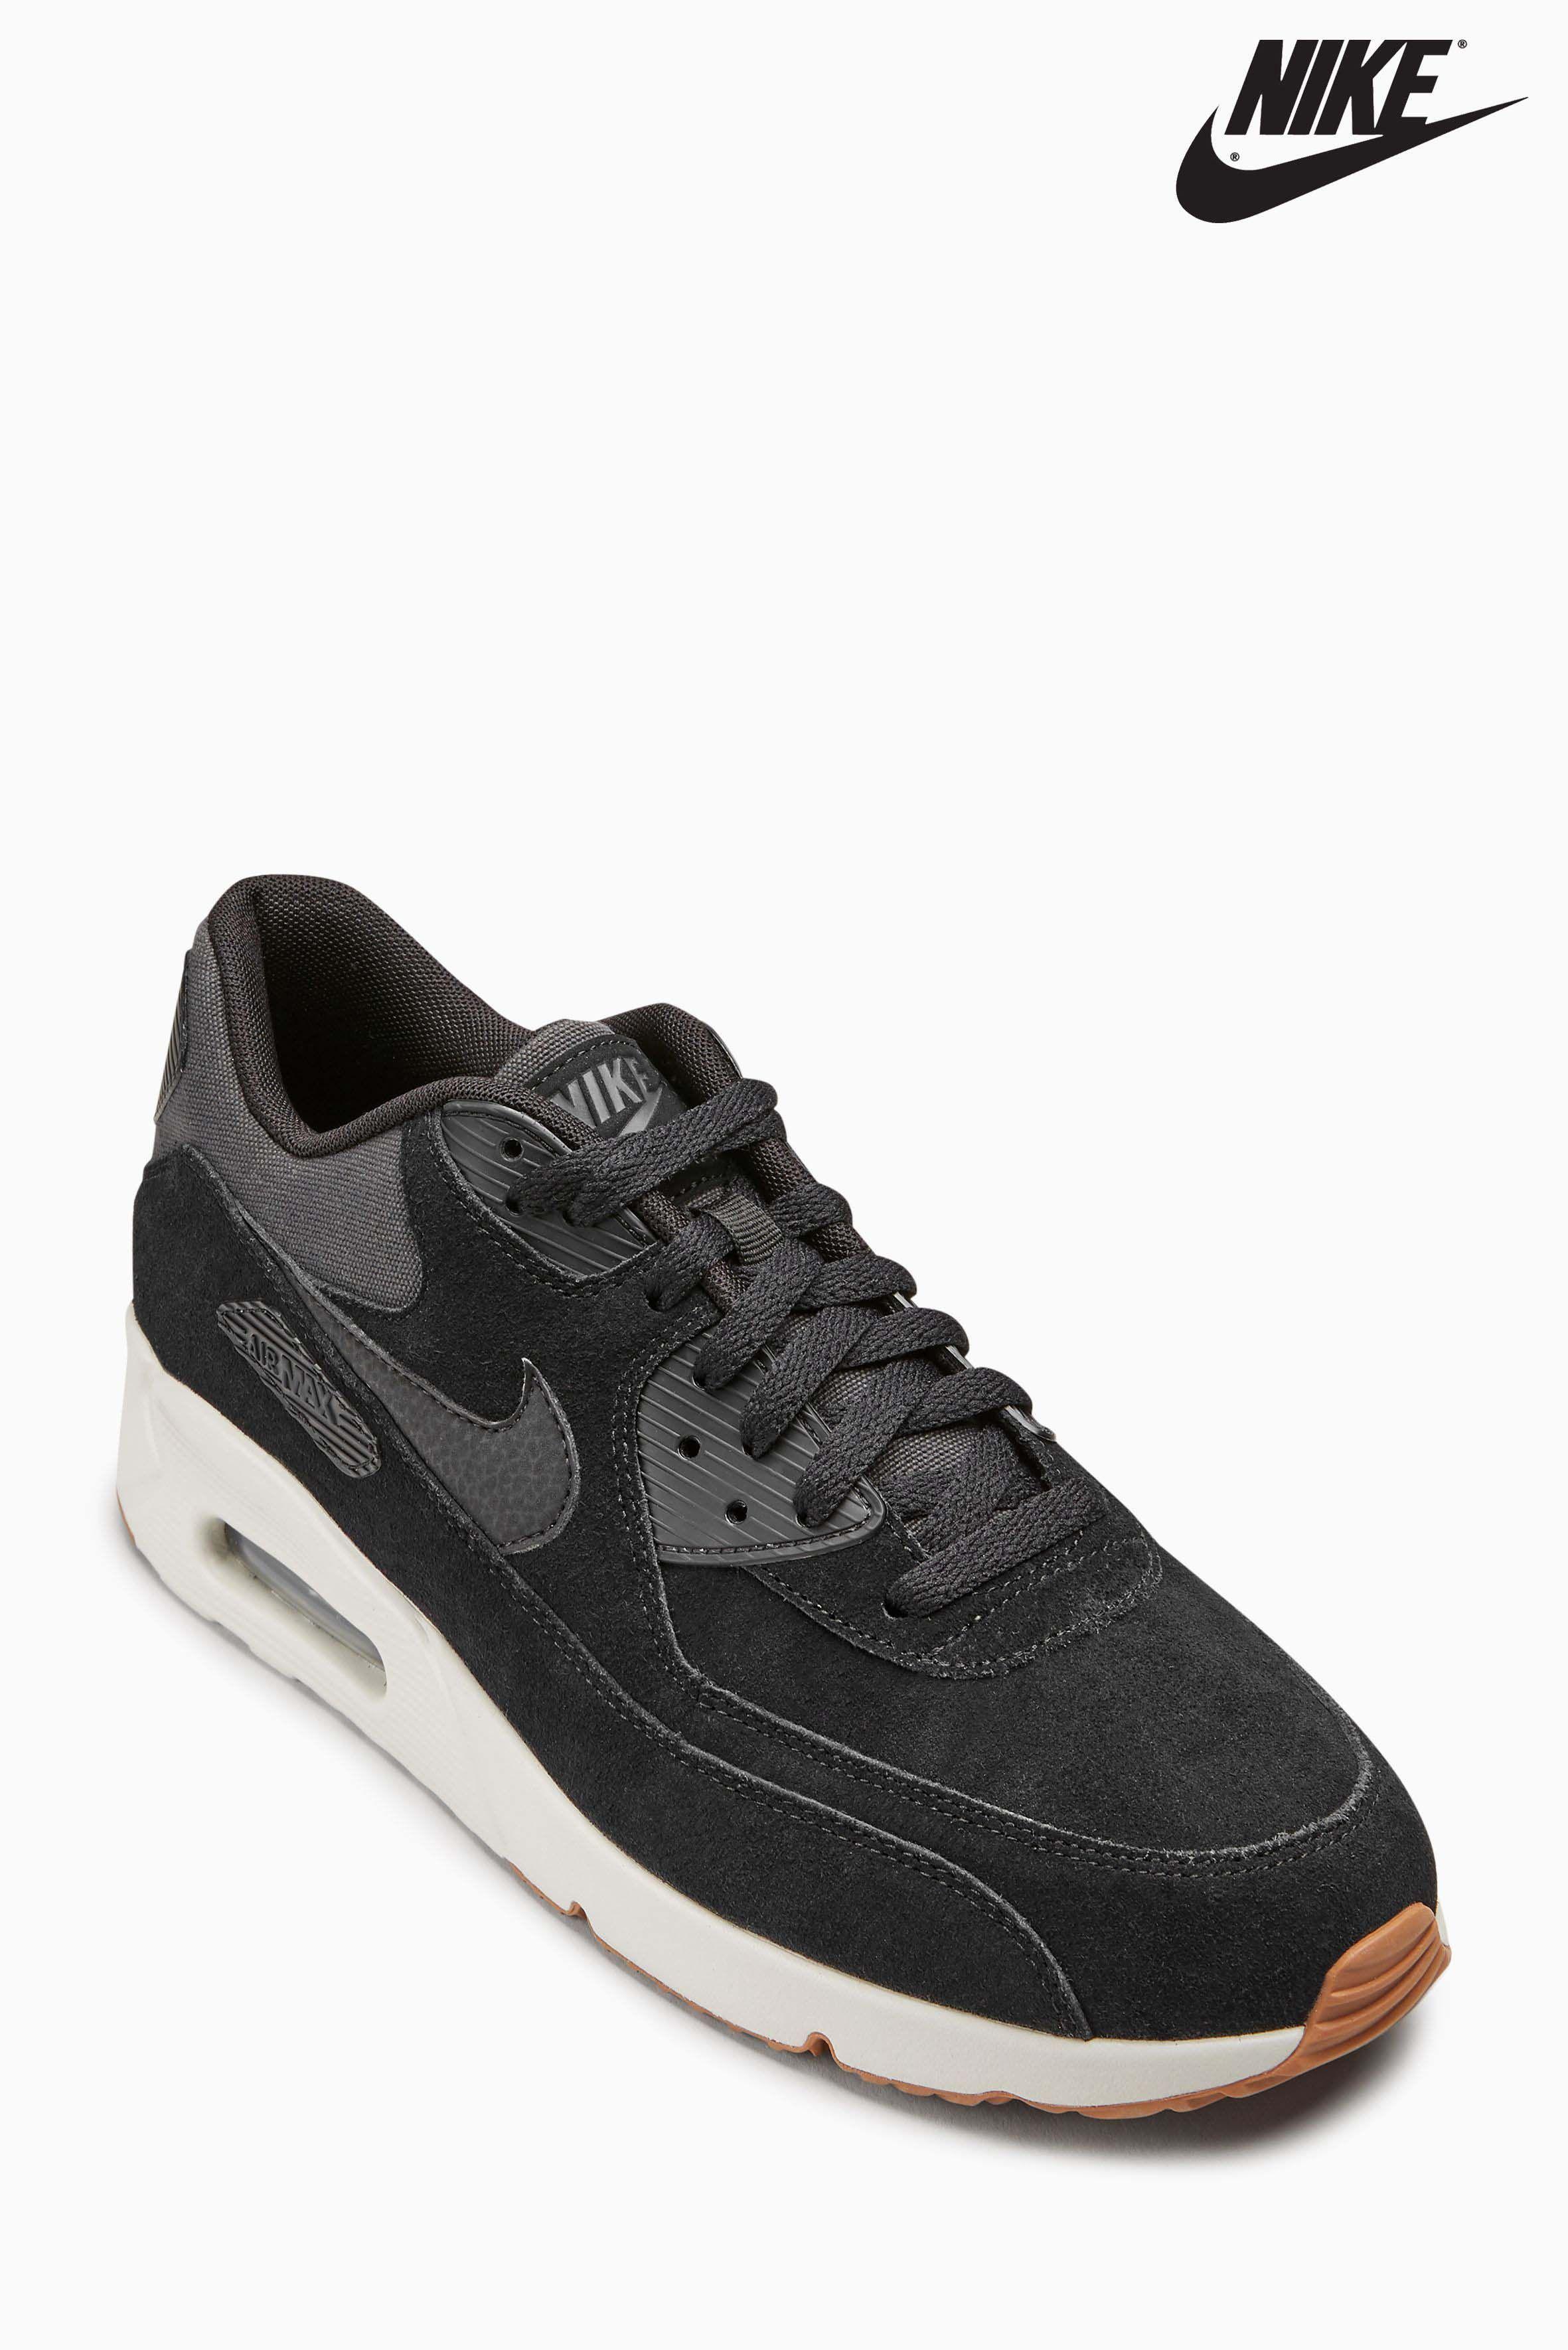 Mens Nike Air Max 90 Ultra - Black